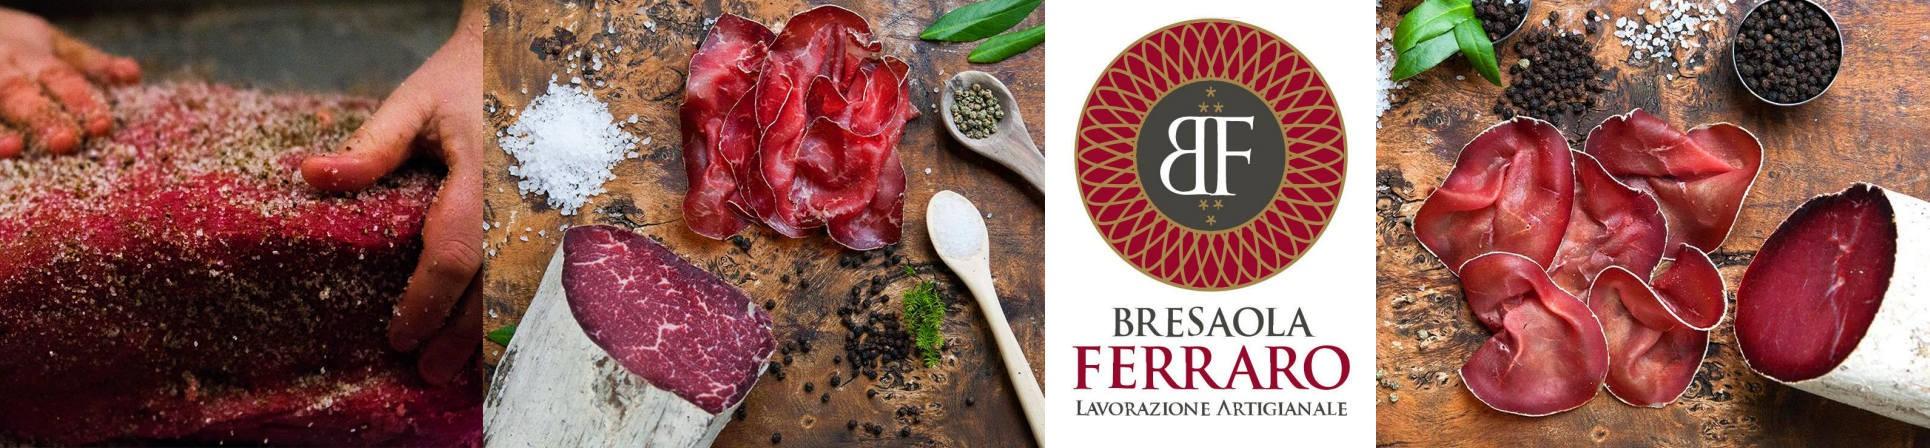 Bresaola della Valchiavenna e Bresaola della Valtellina vendita online Bresaola FERRARO